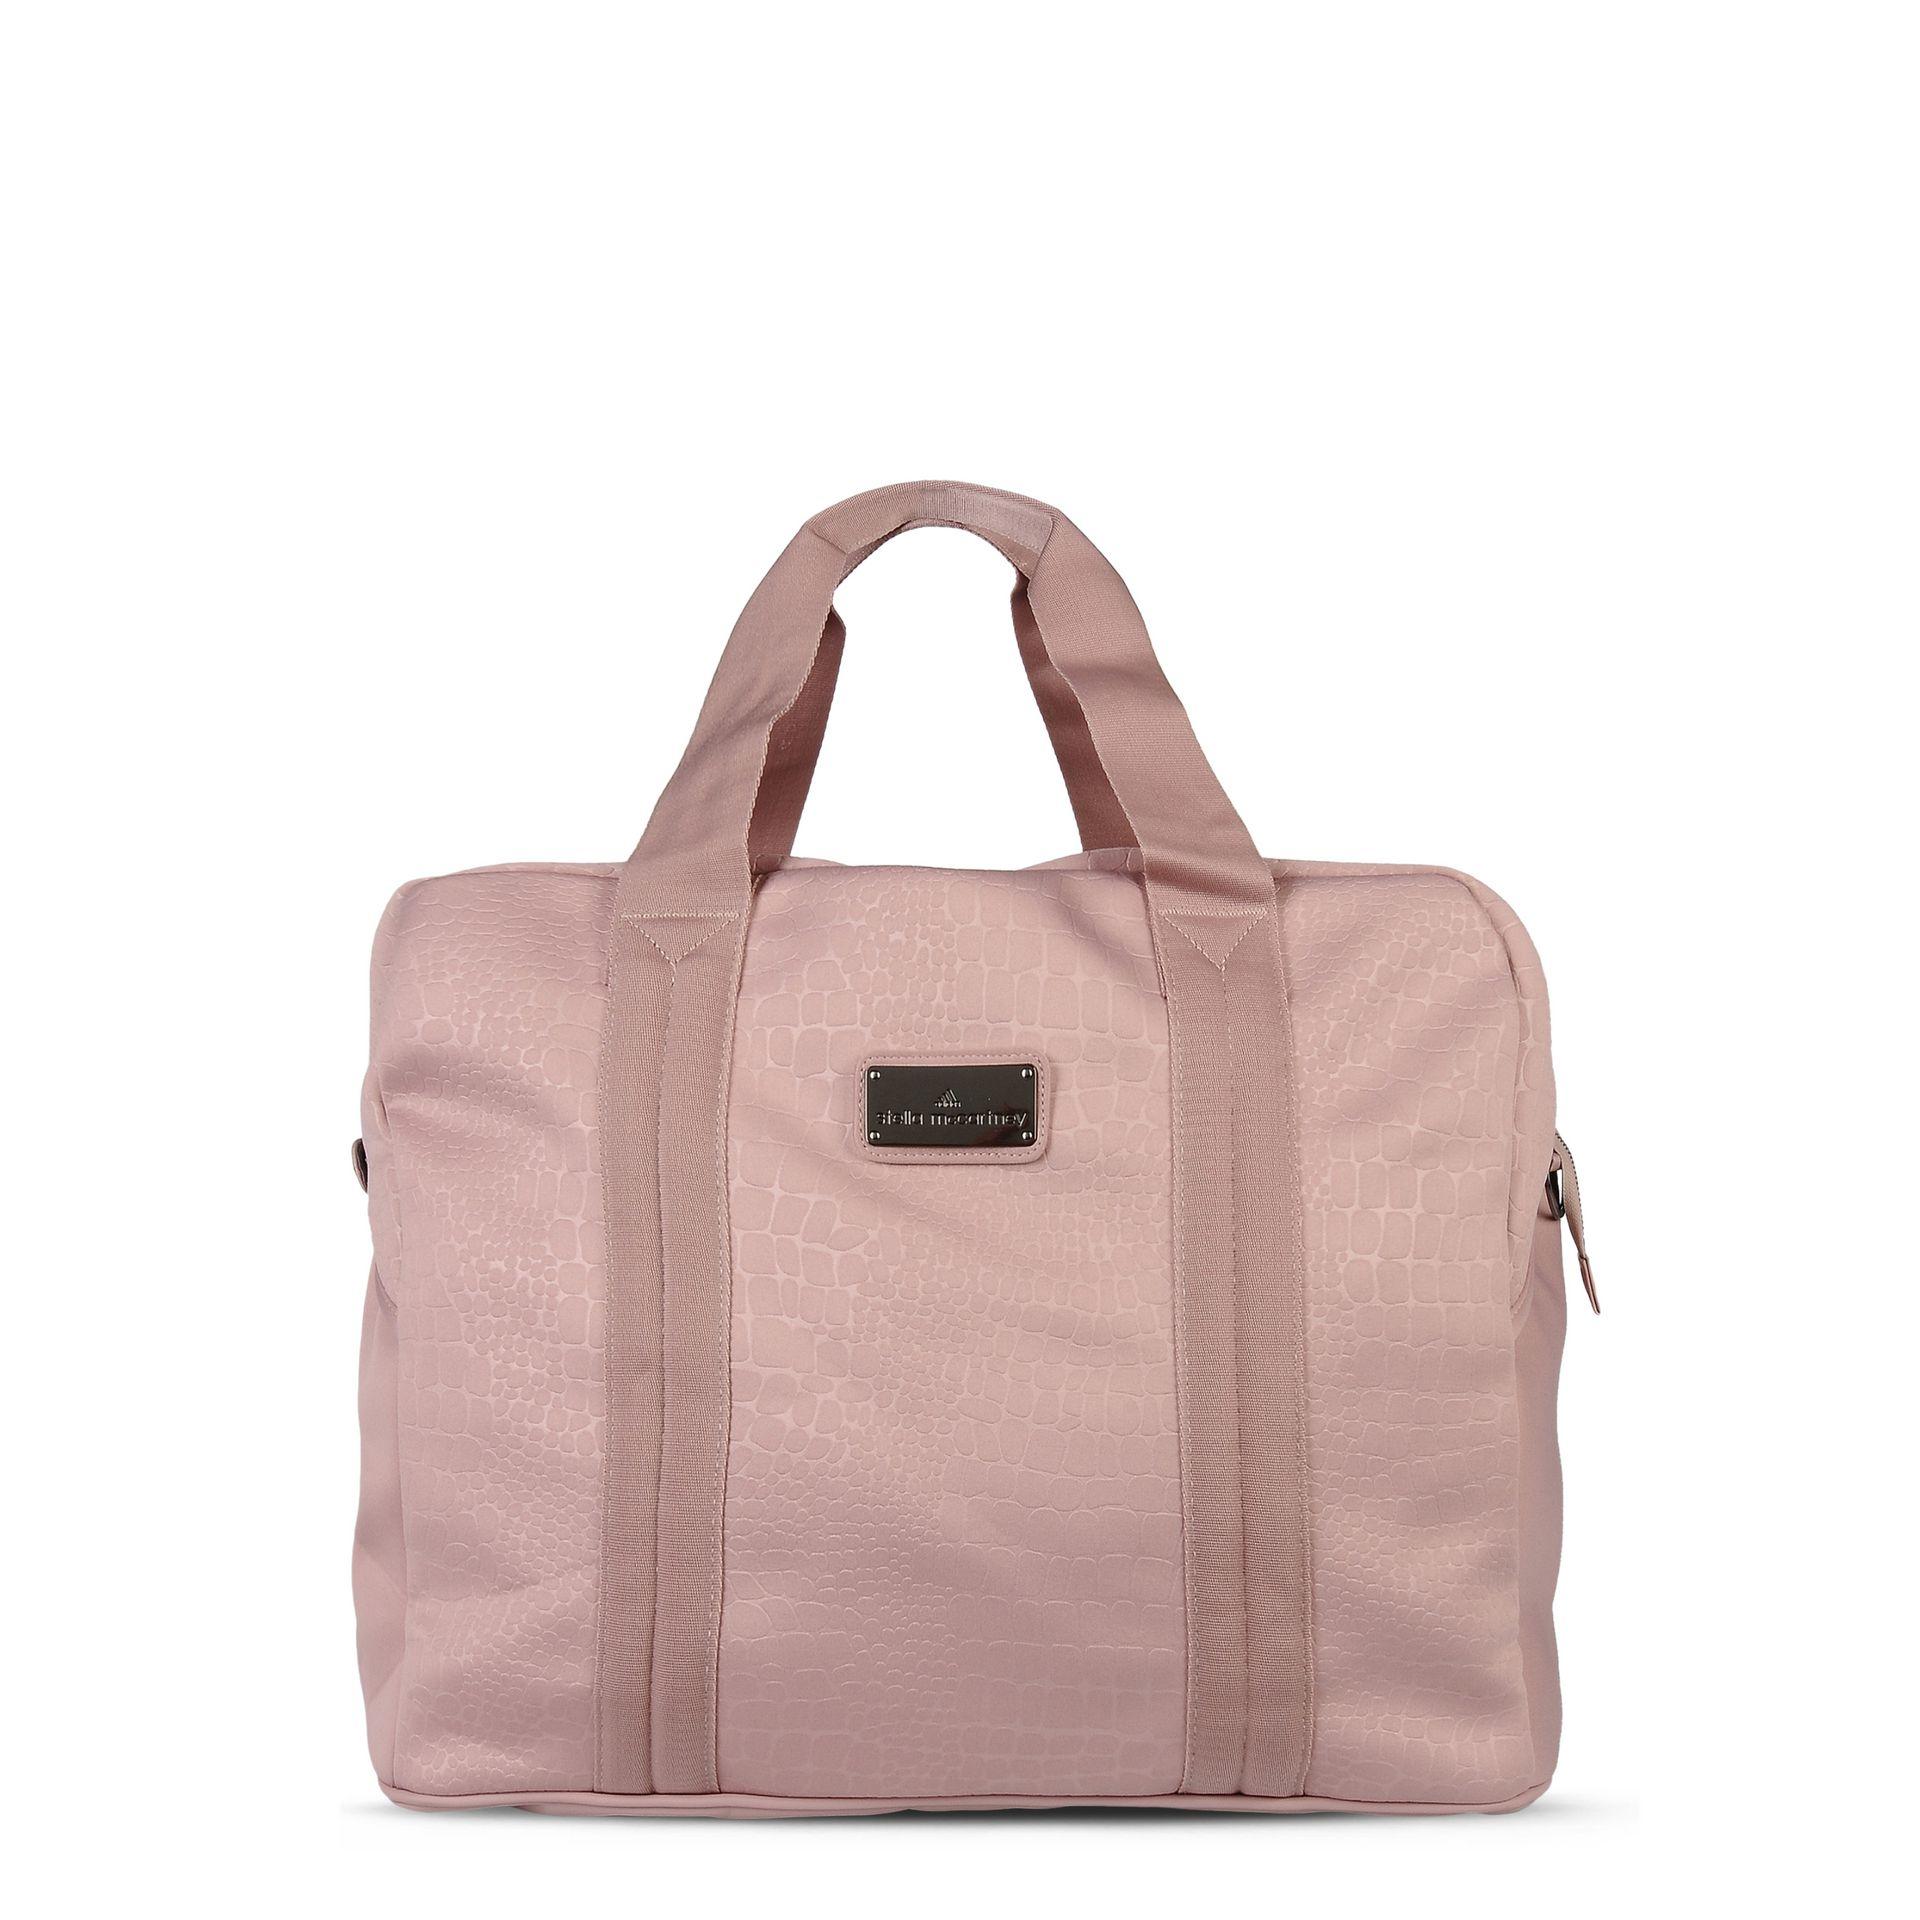 Lyst - adidas By Stella McCartney Pink Essentials Sports Bag in Pink 6855912422374